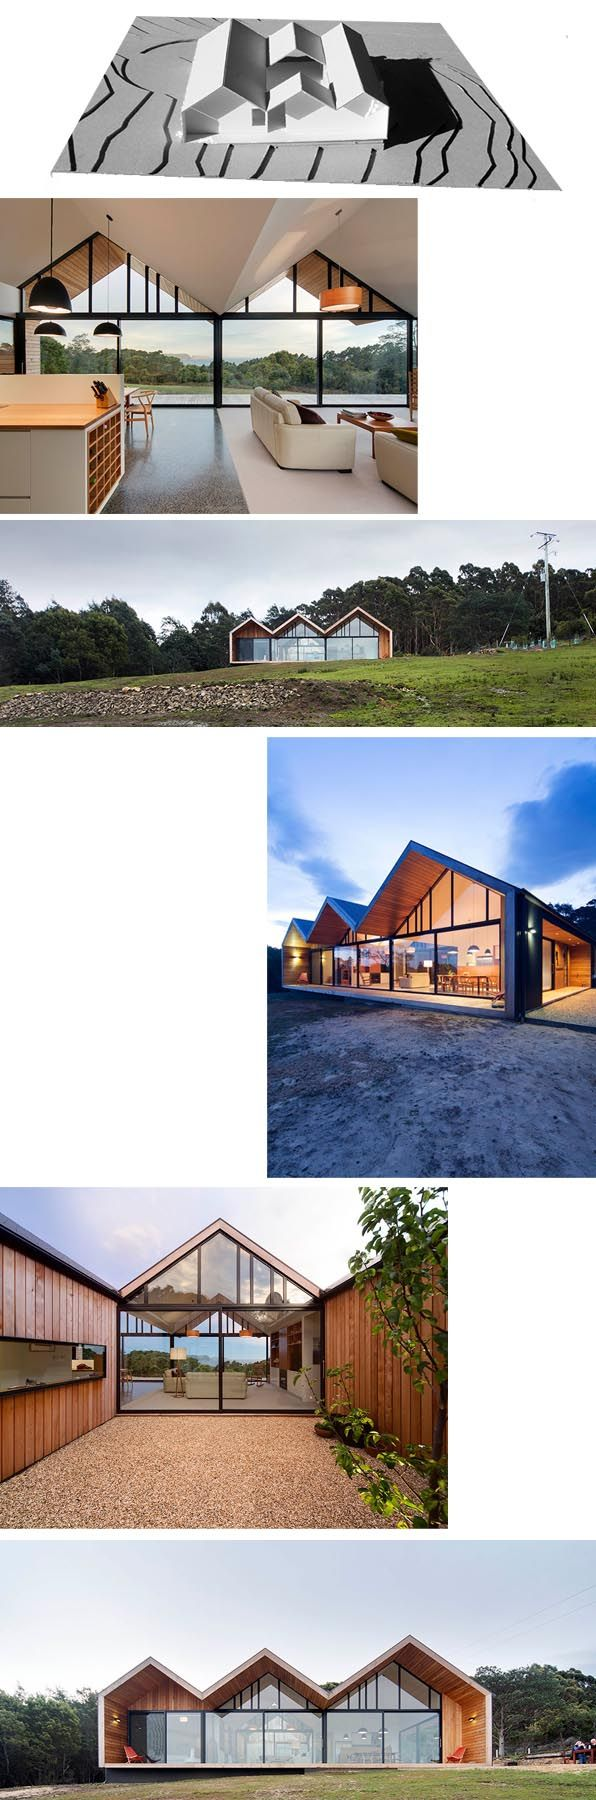 arquitectura modular prefabricada industrializada casa vivienda contemplación architecture house contemplate dwell modus vivendi arquitectura modusvivendi arquitectos madrid